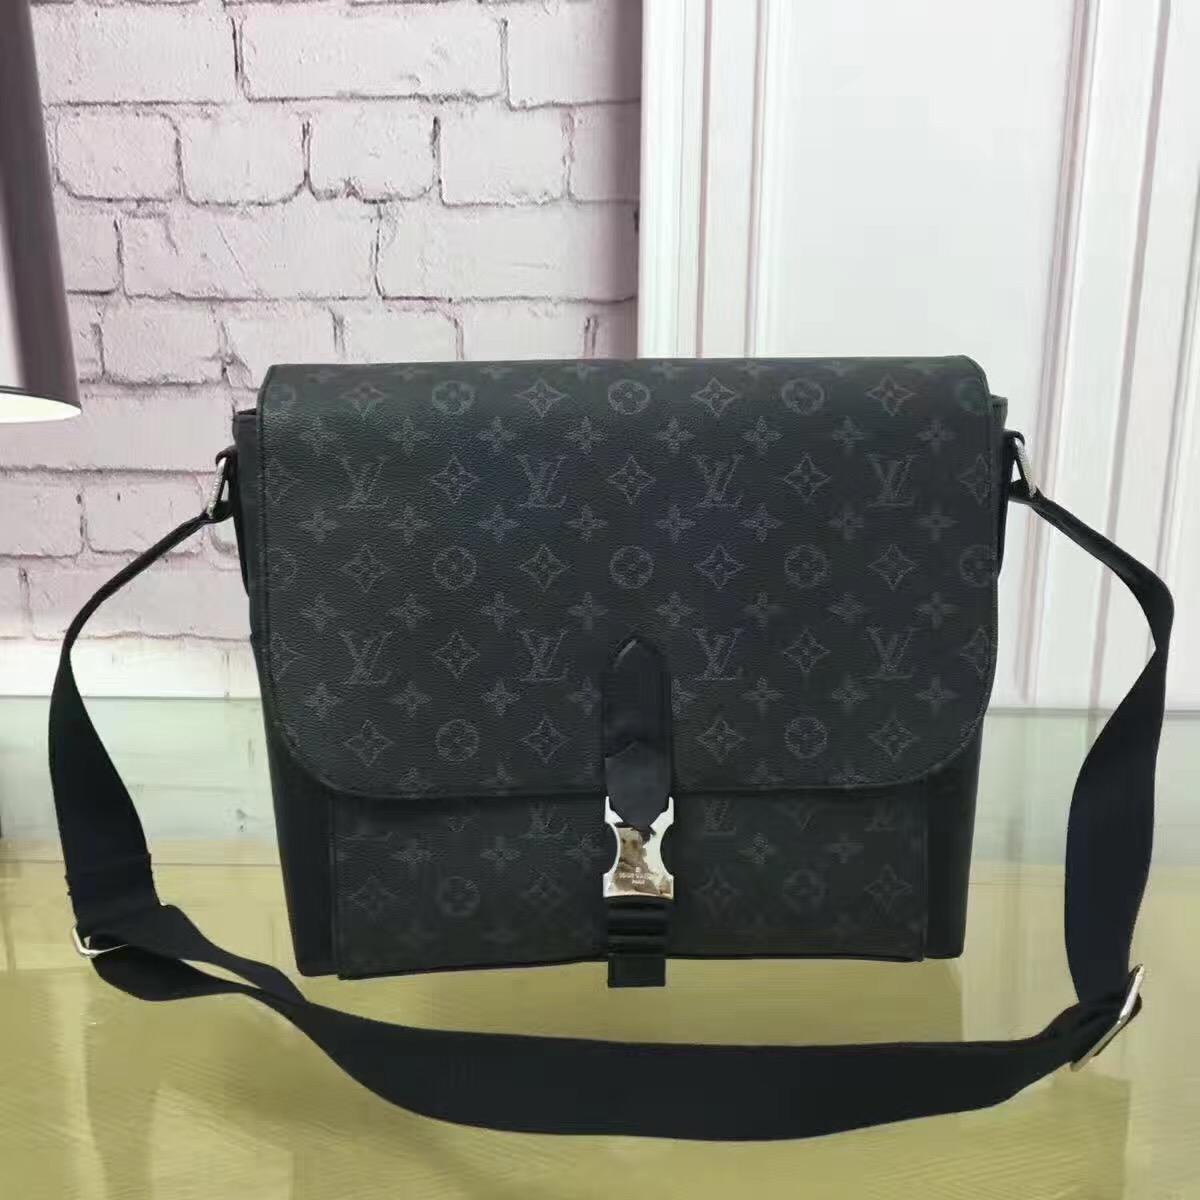 b808efd34b25 The Best Louis Vuitton Men Replica Handbags Online Store